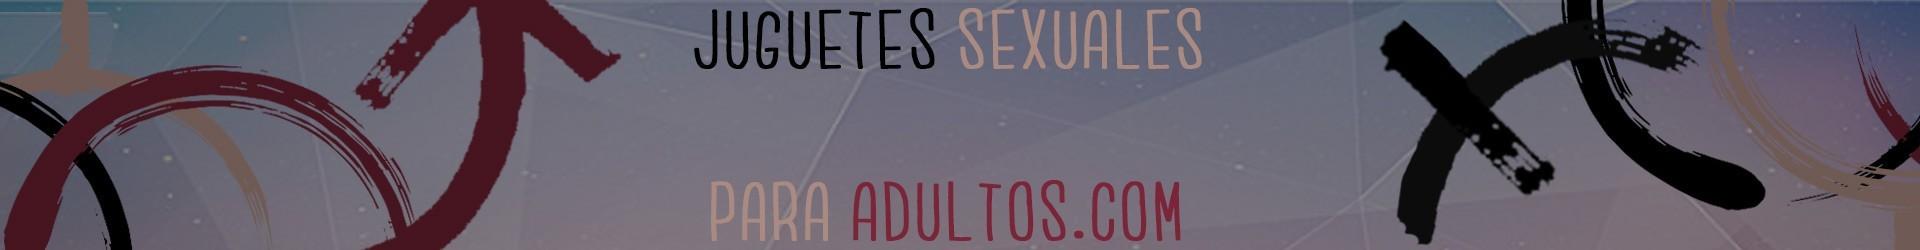 Esposas - Juguetes Sexuales para Adultos Sex Shop